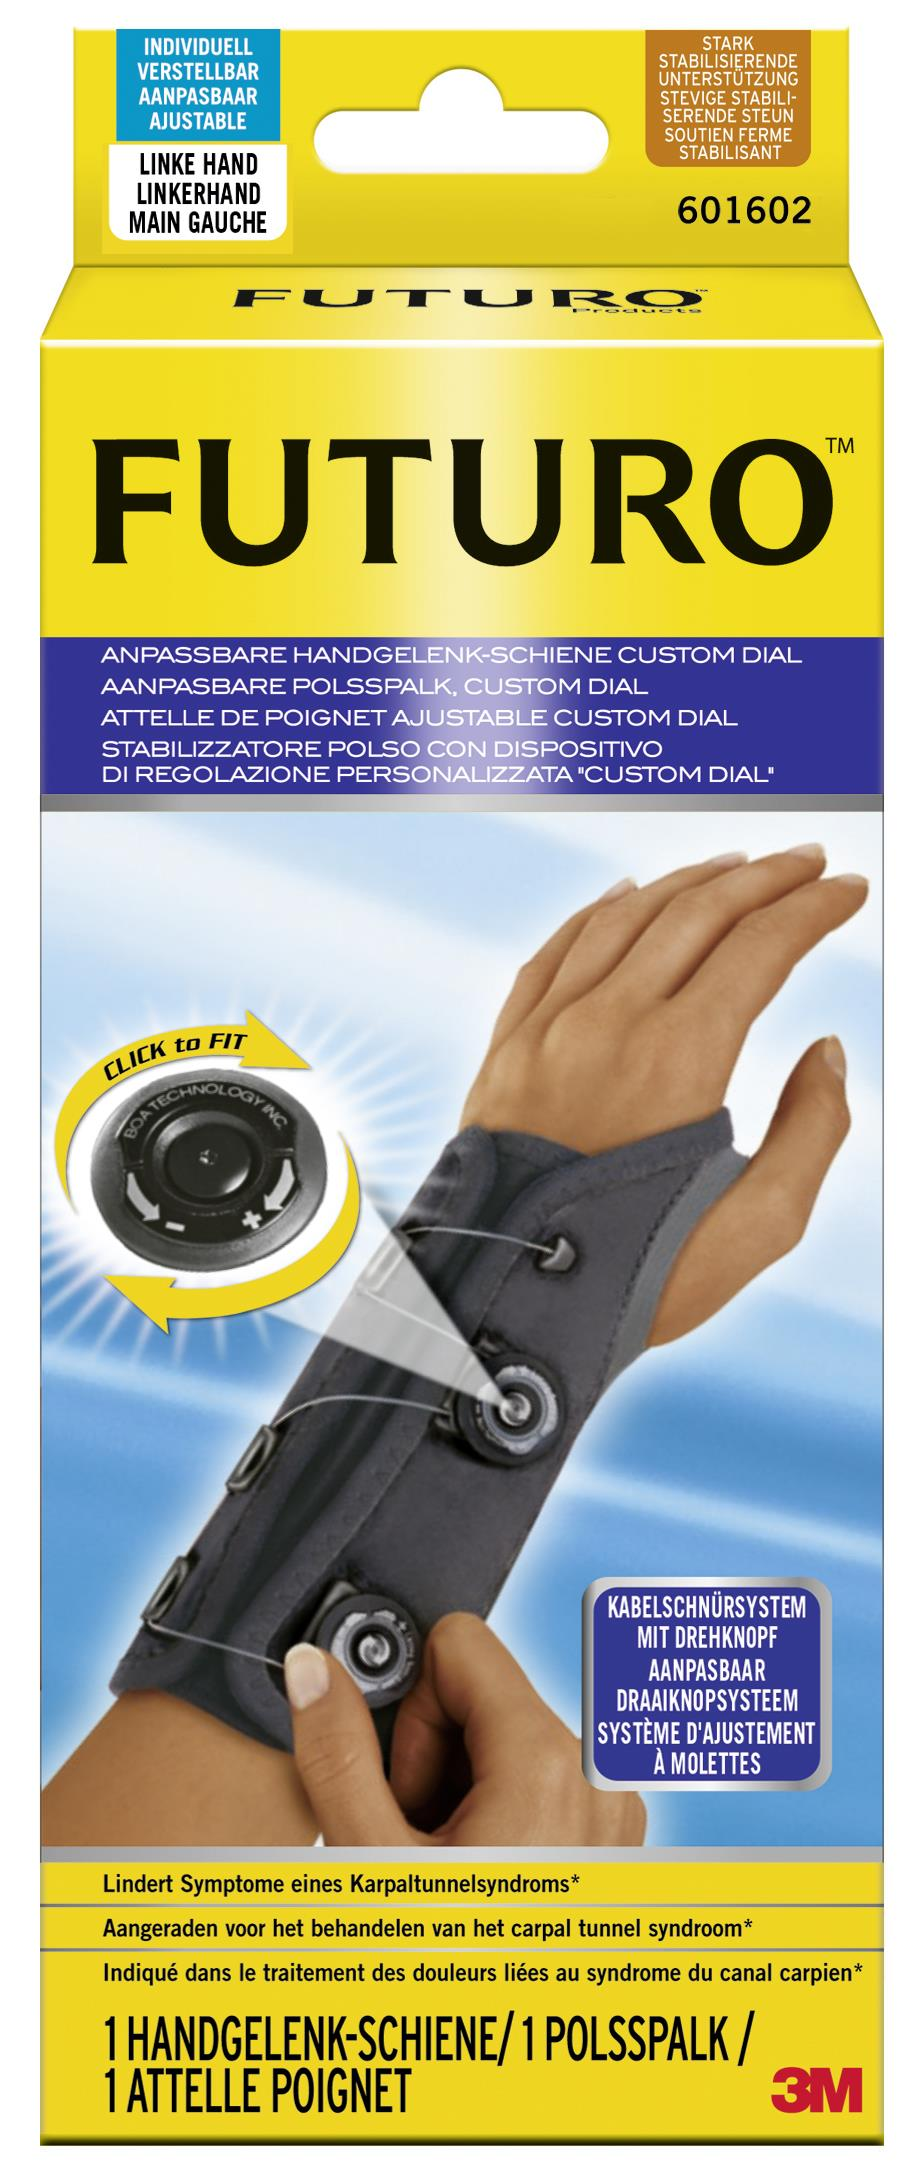 Futuro Custom Dial Handgelenk-Schiene, anpassbar